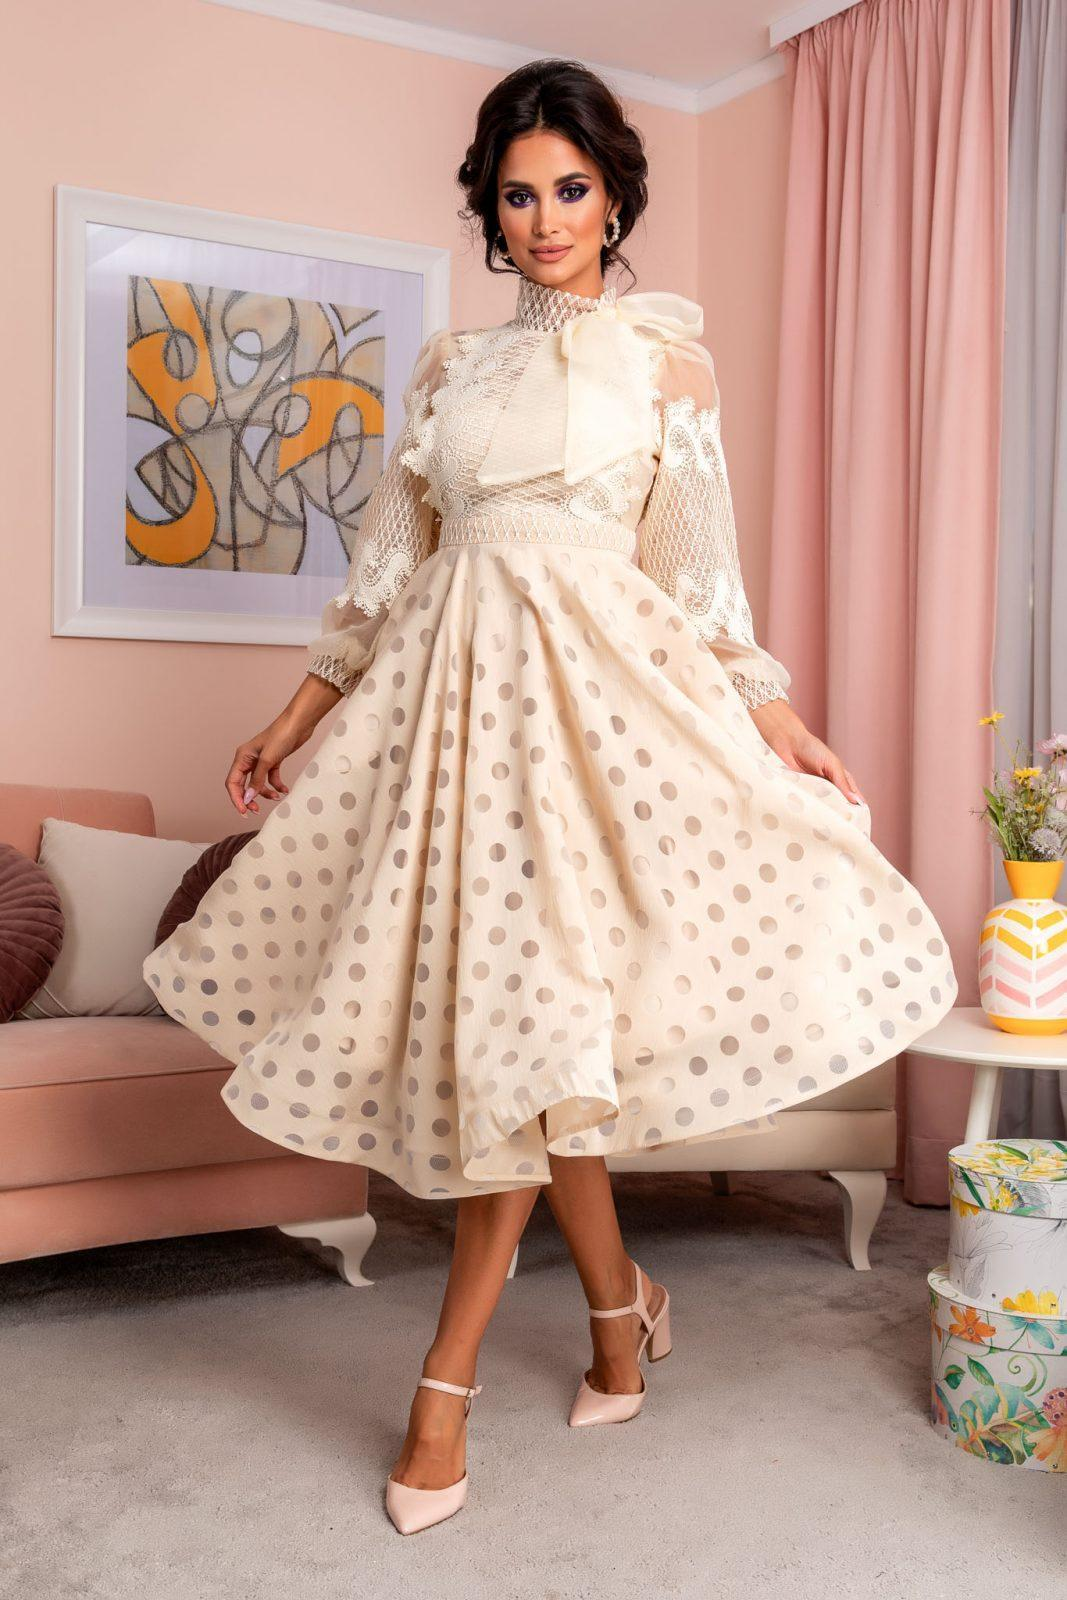 Nude Βραδινό Φόρεμα Με Δαντέλα Radiant 8203